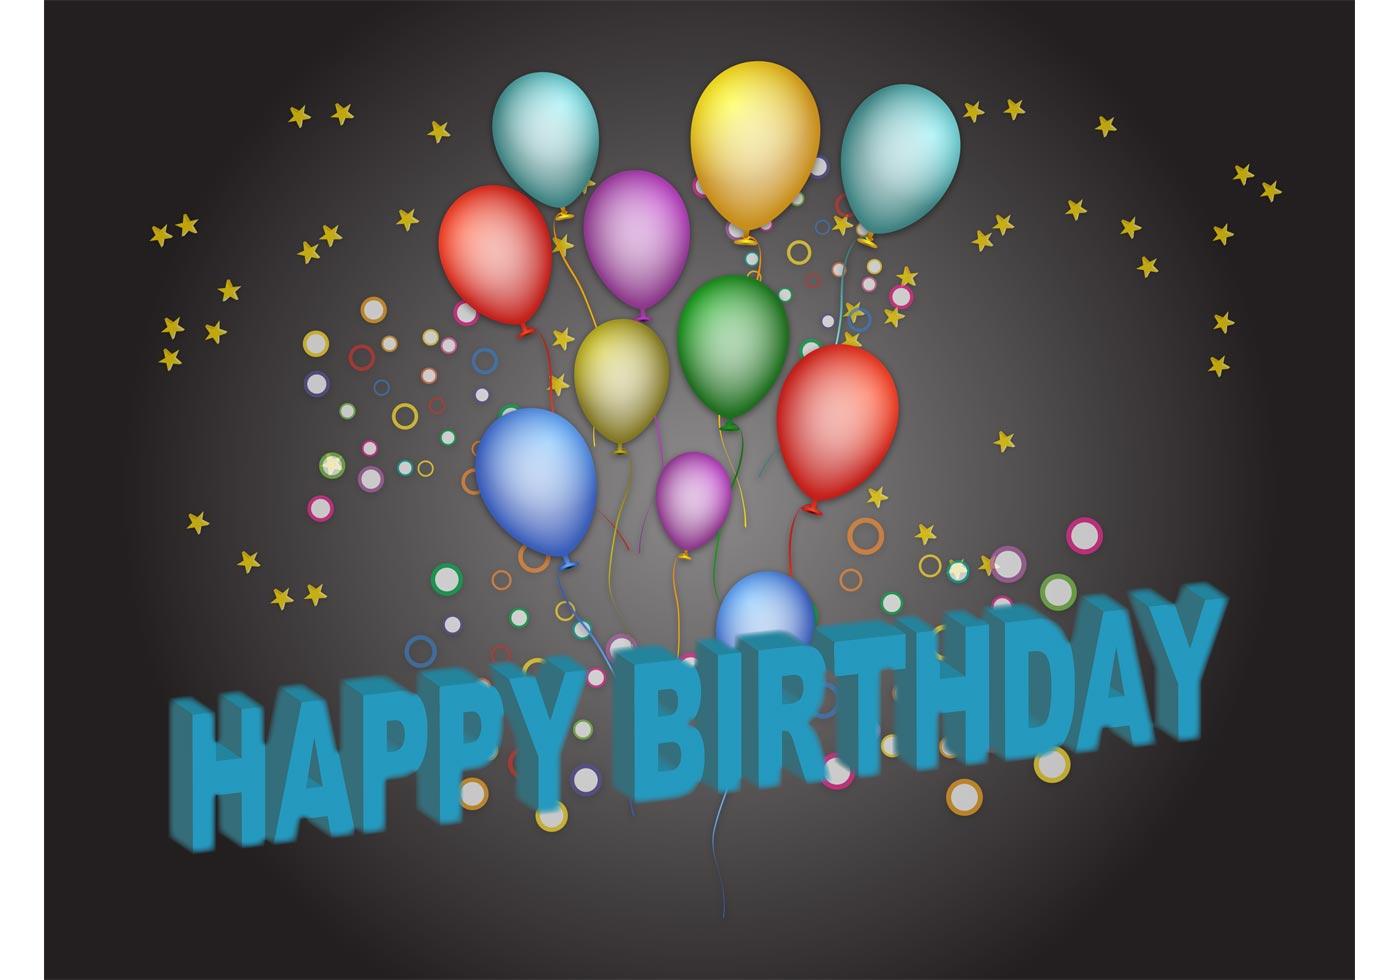 Birthday poster download free vector art stock graphics images for Birthday posters free download